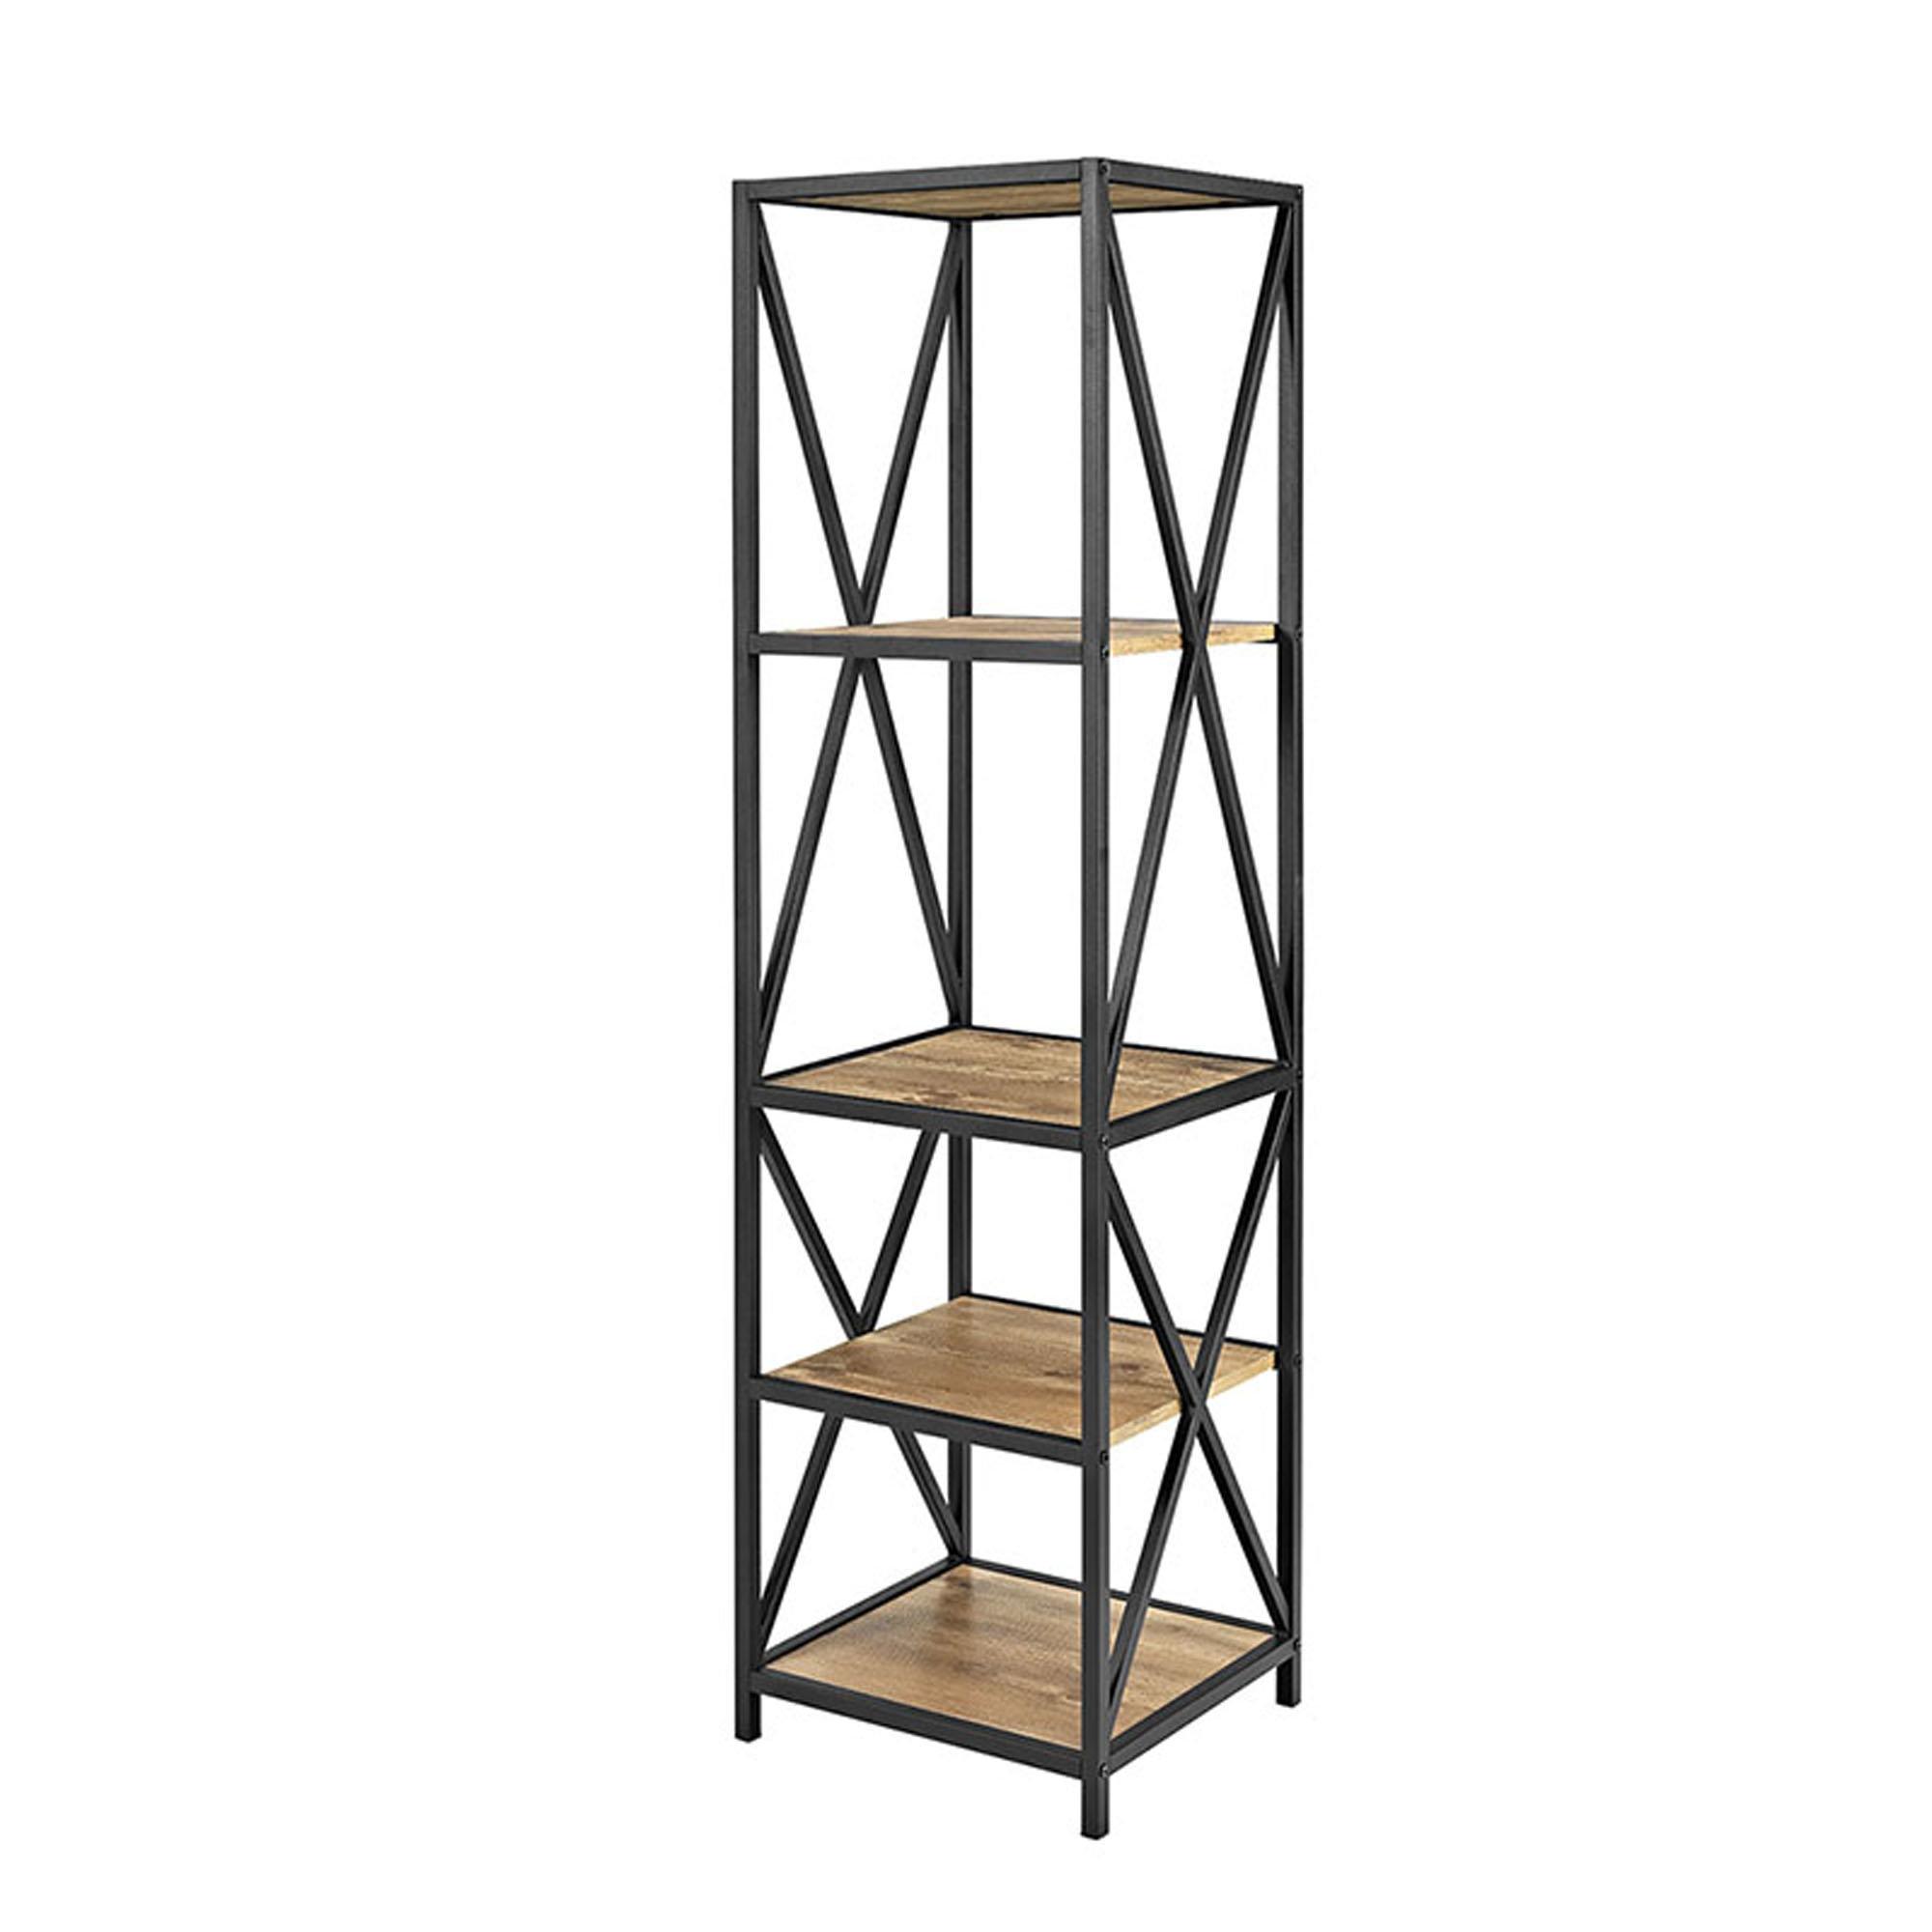 Latest Augustus Etagere Bookcase Regarding Bowman Etagere Bookcases (View 14 of 20)